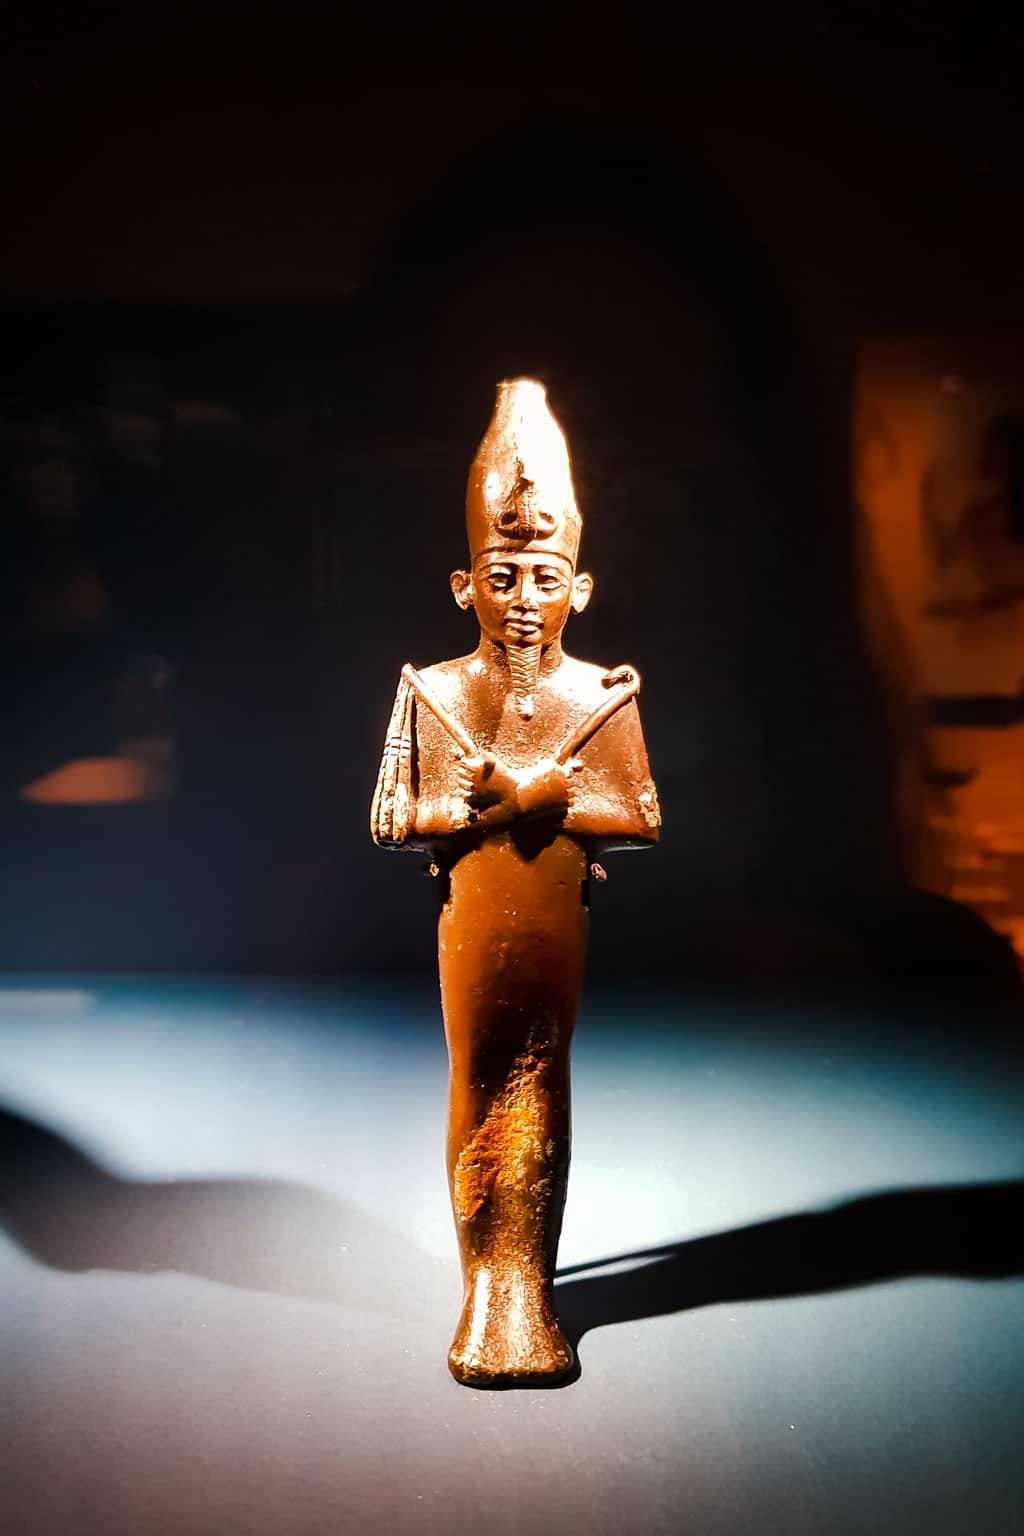 Egyptian Statue at Medelhavsmuseet